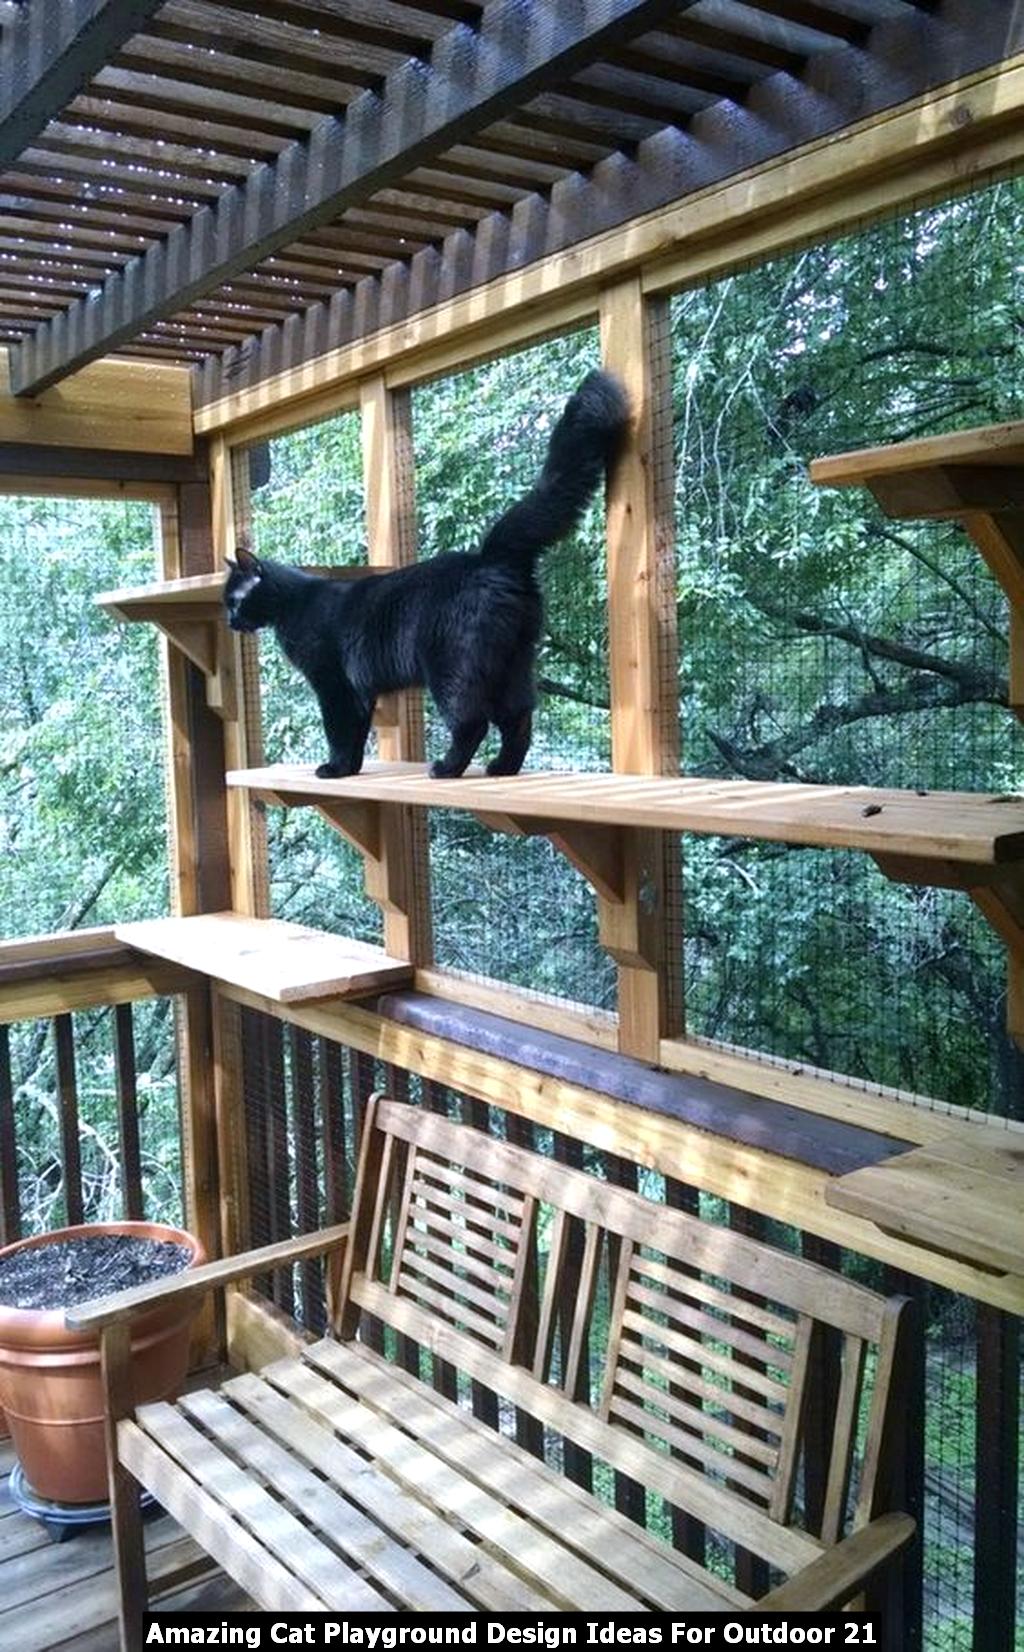 Amazing Cat Playground Design Ideas For Outdoor 21